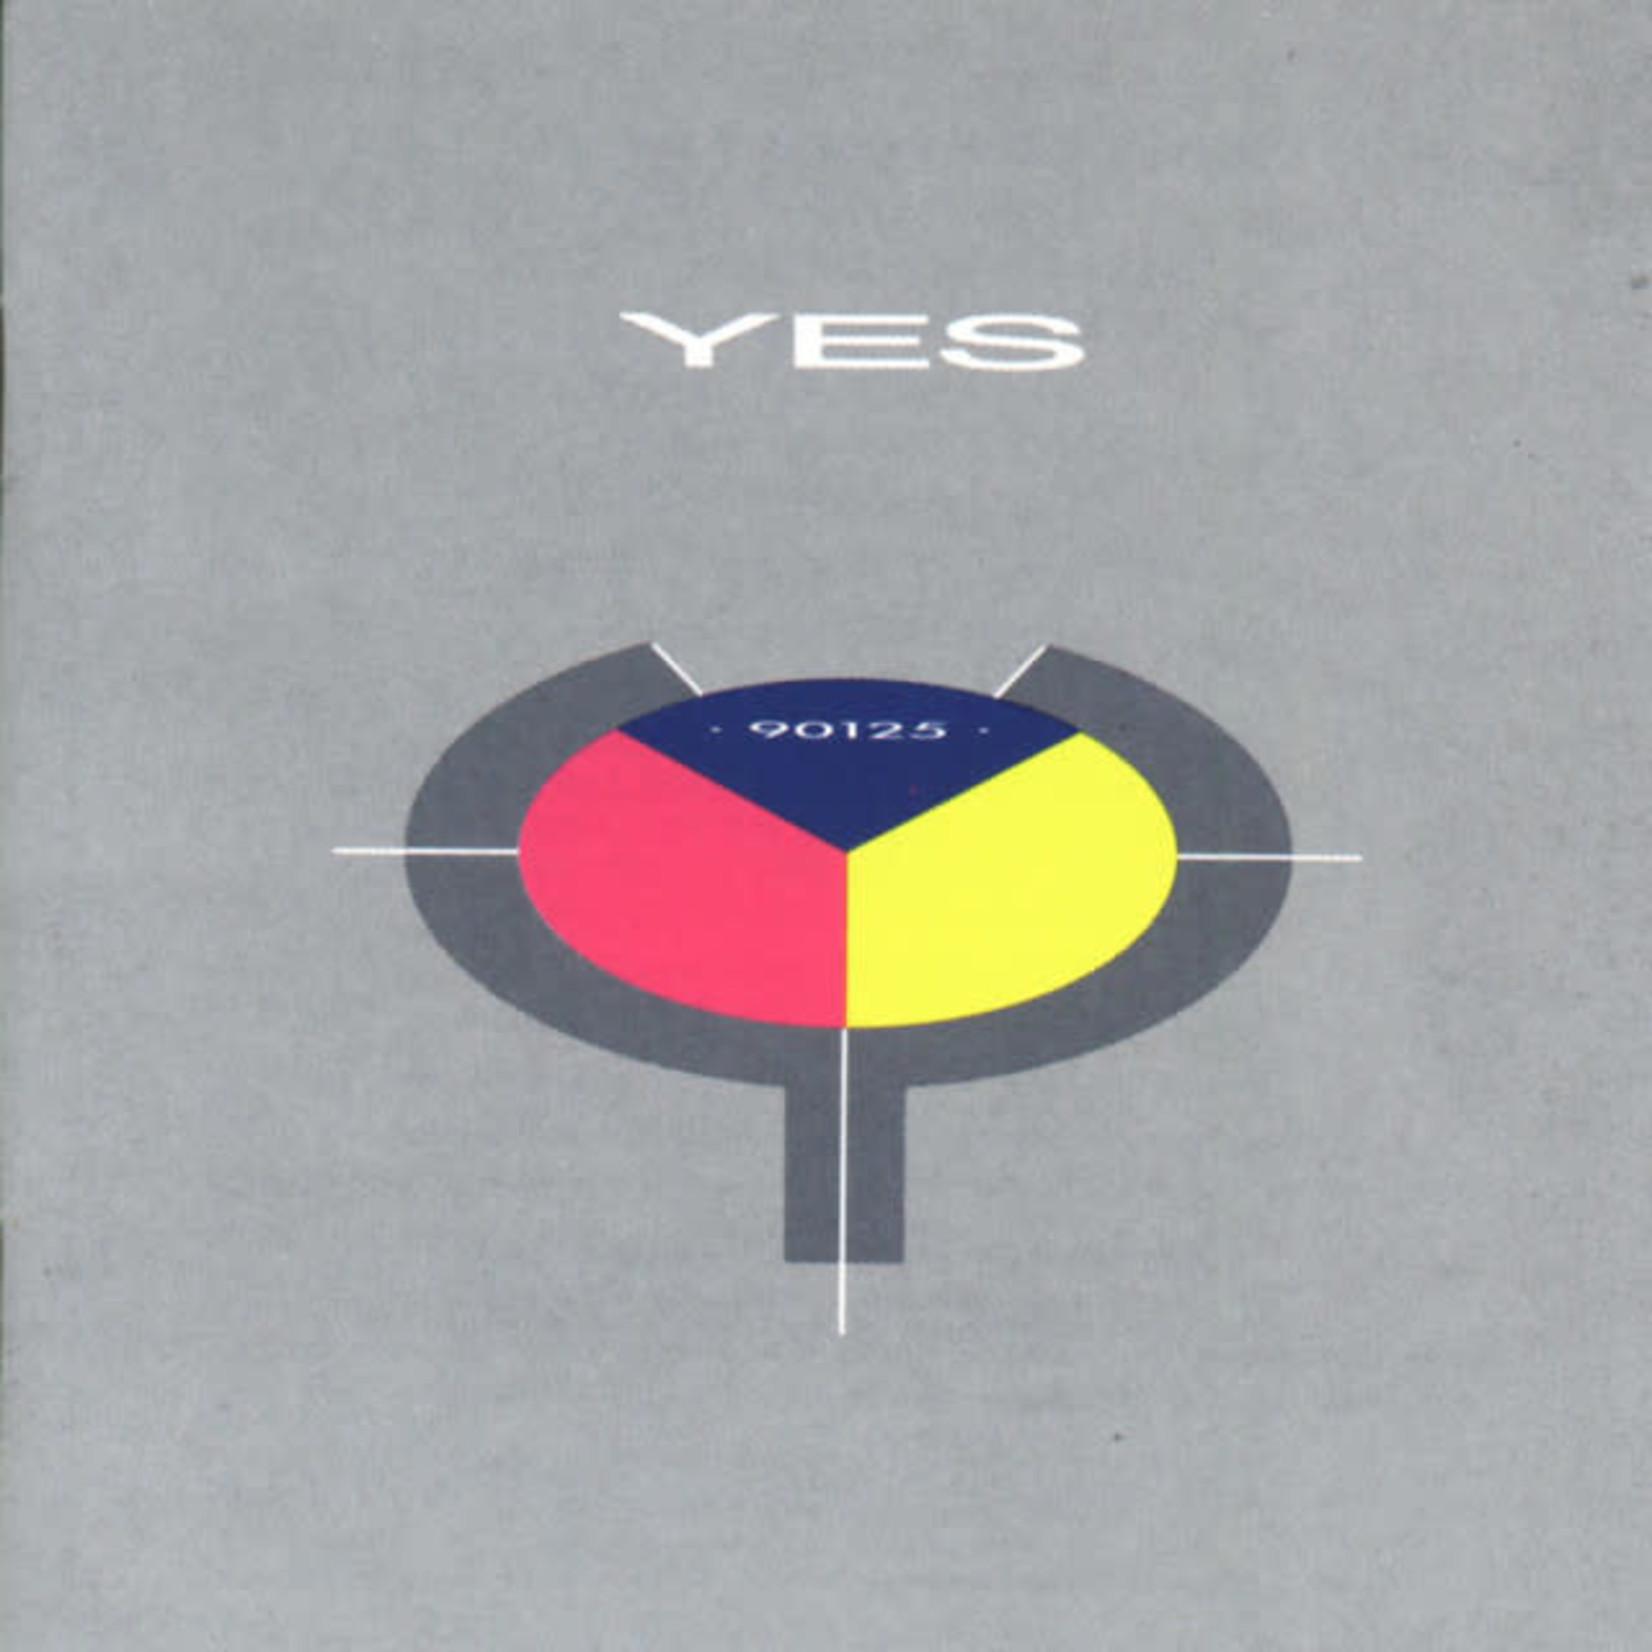 Vinyl Yes - 90125